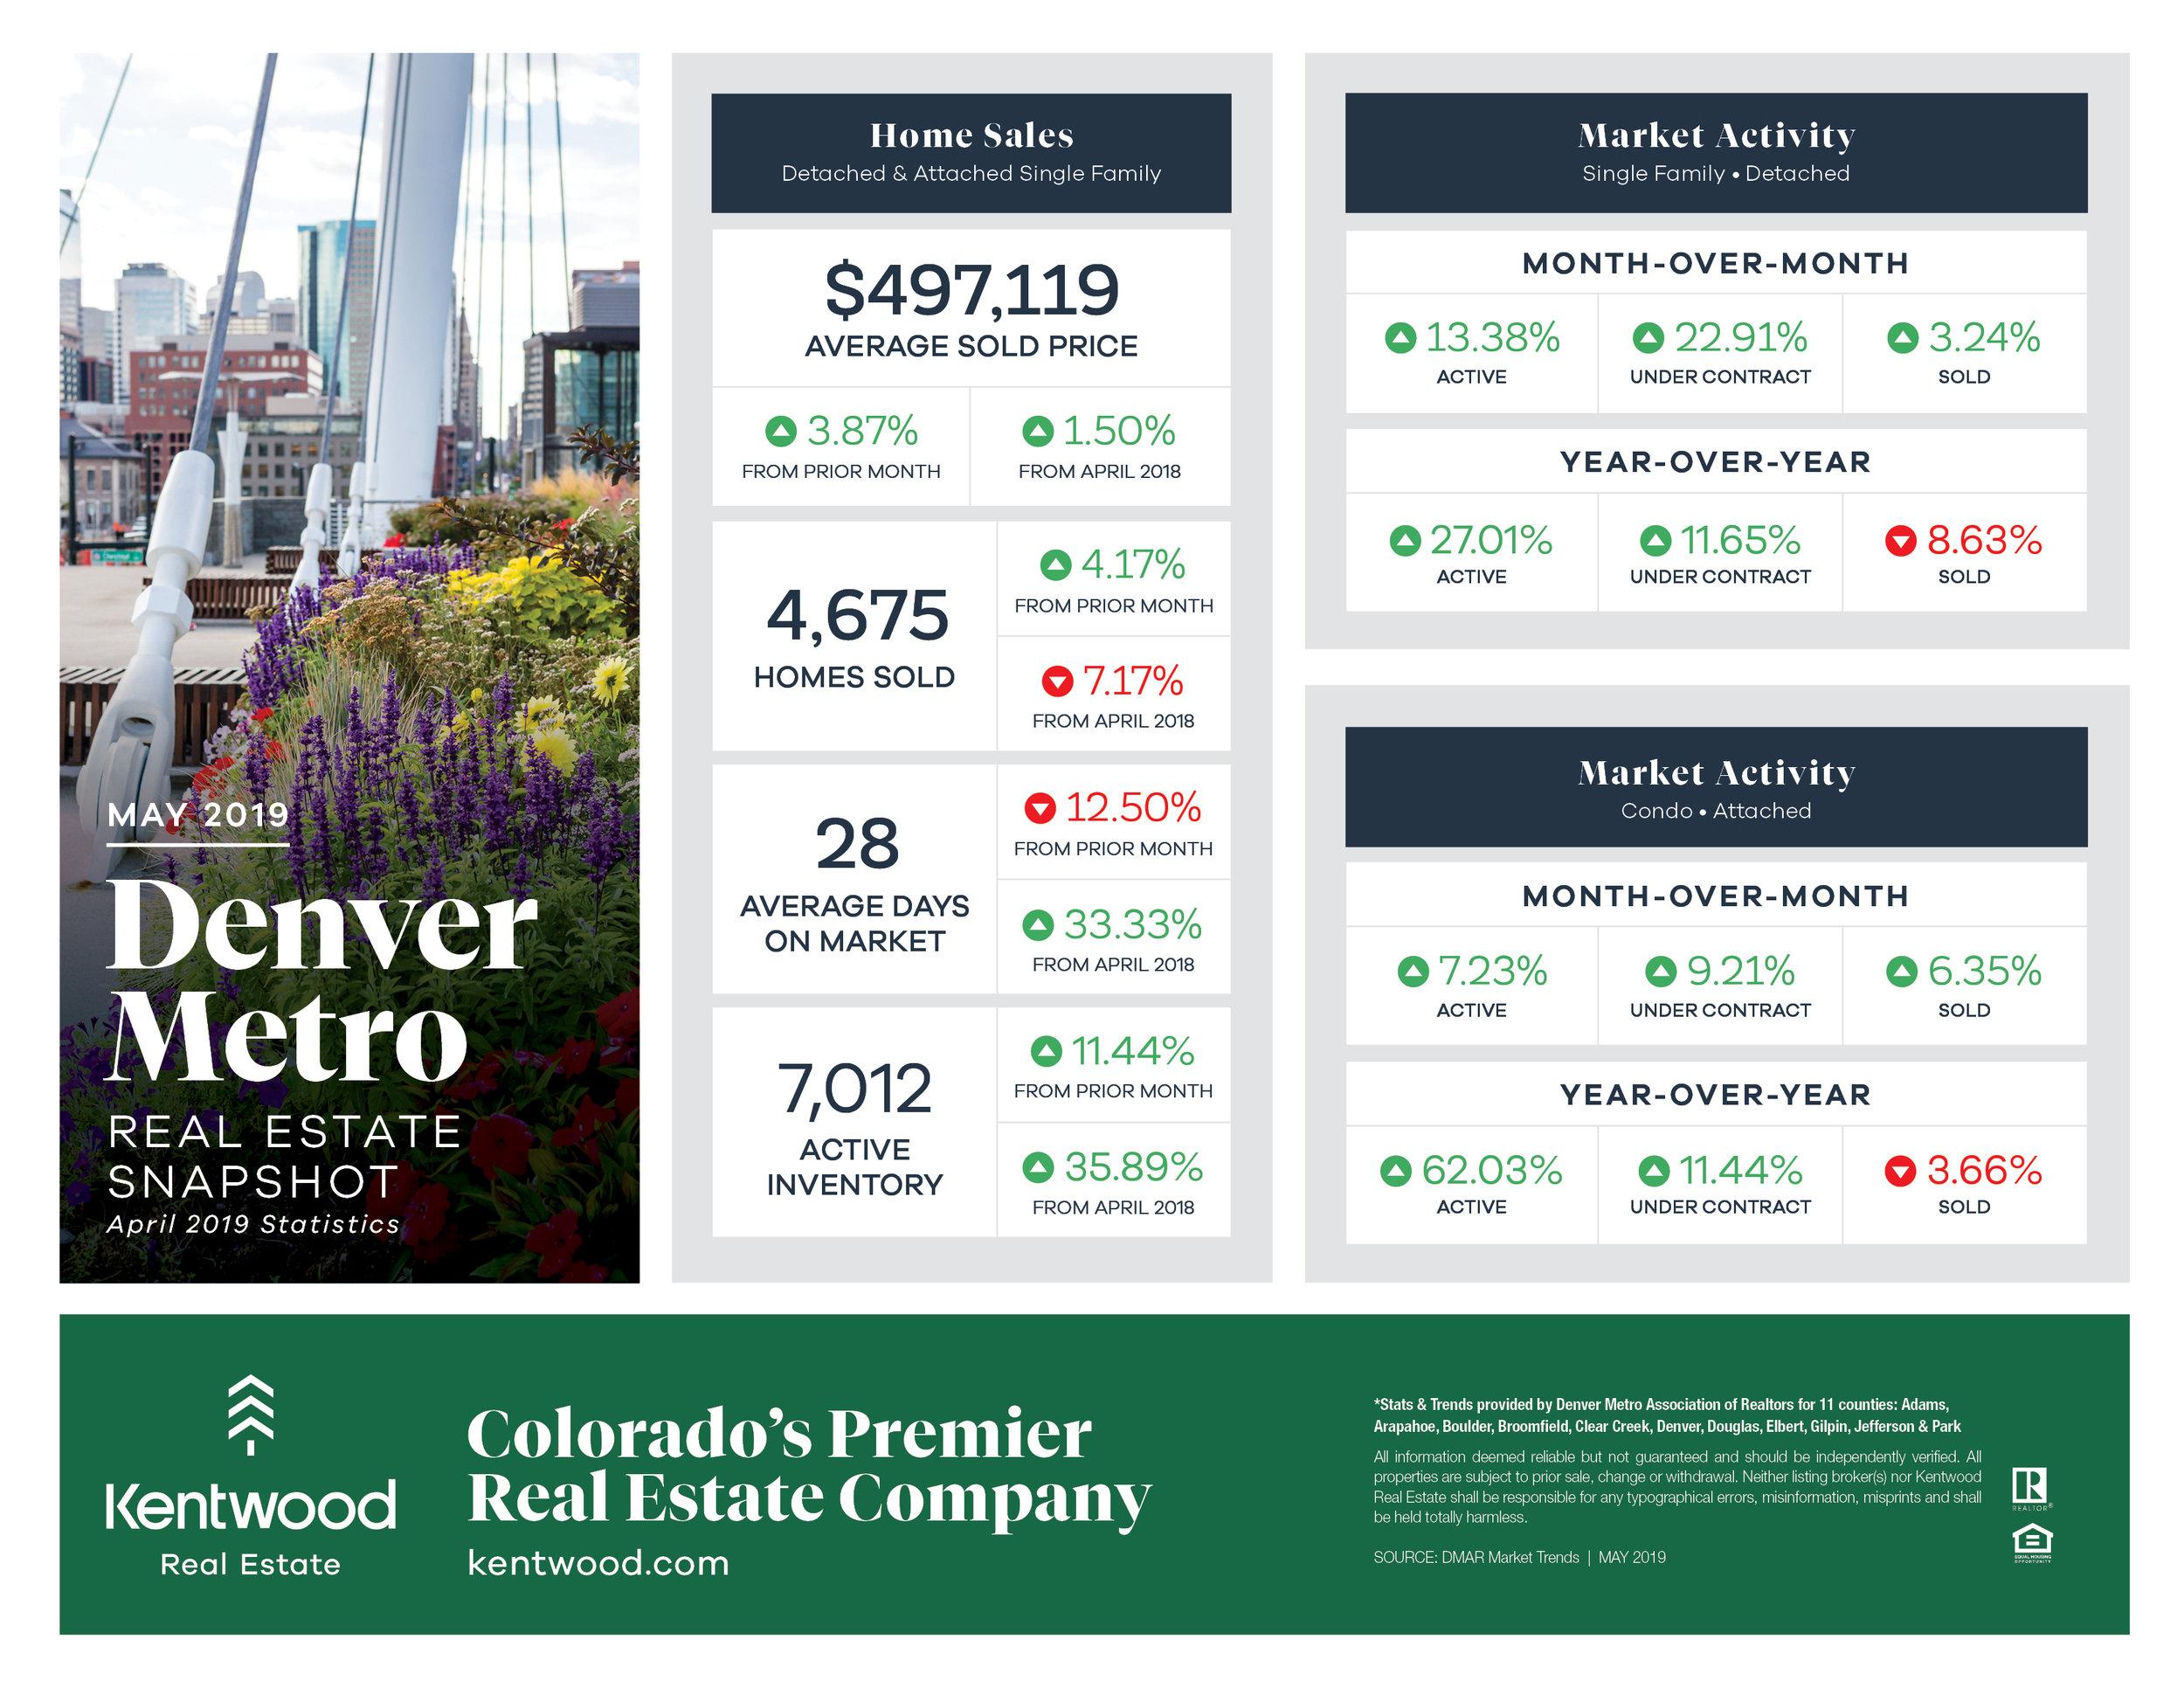 May_Denver_Metro_StatsUpdatedBranding.jpg